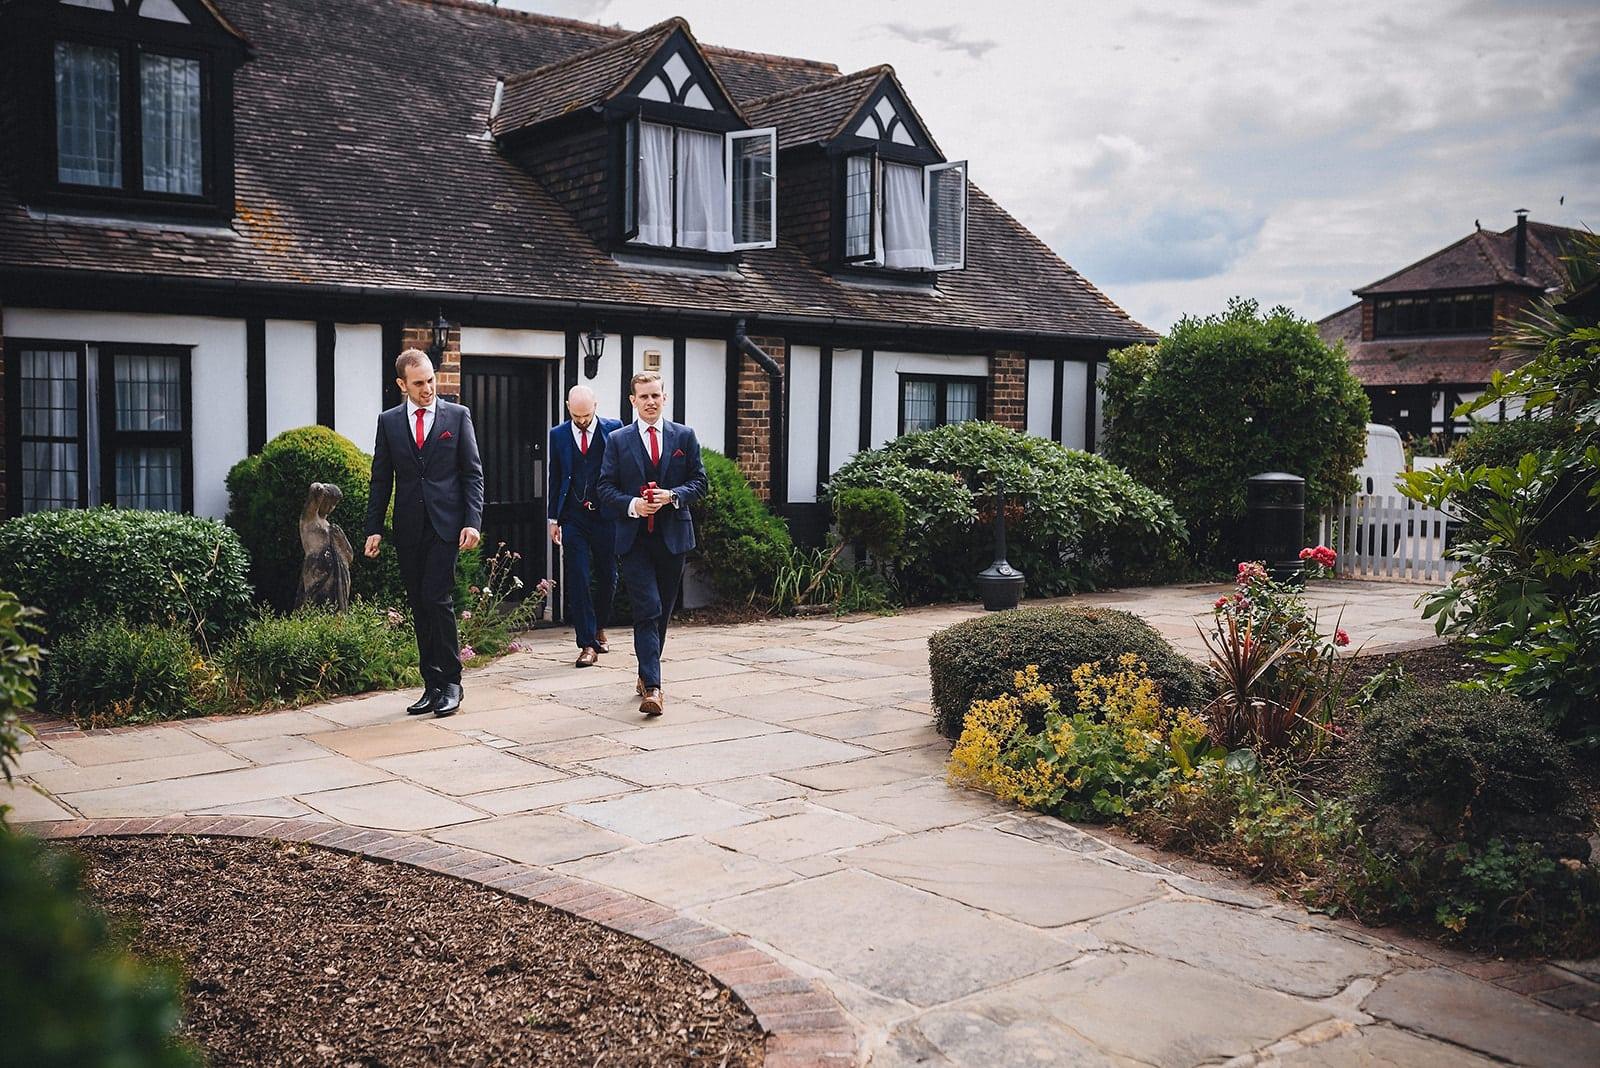 Groom and groomsmen walk towards a Hever Hotel Microwedding ceremony